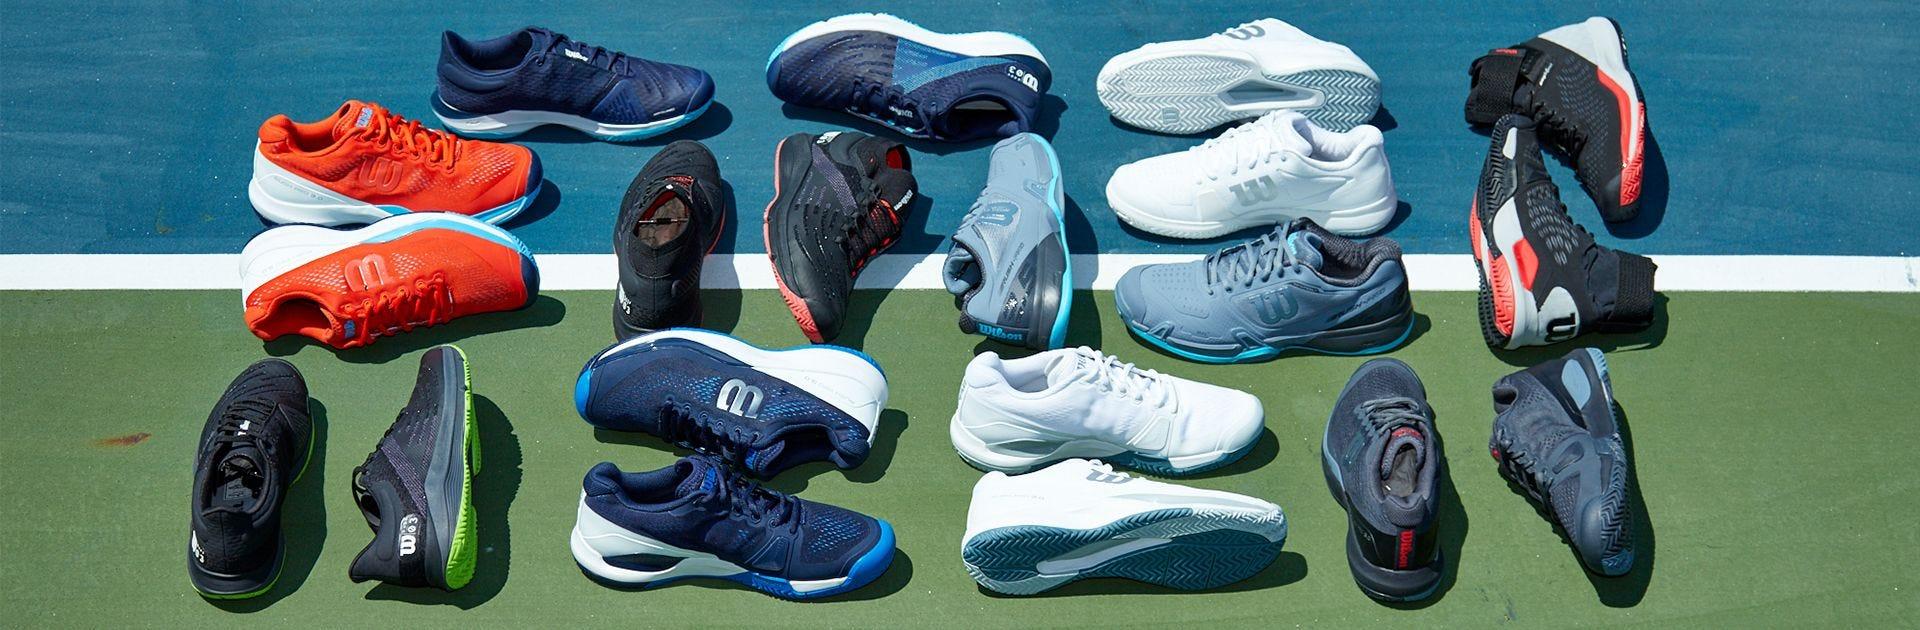 Wilson Men's Shoe Range on Tennis Court